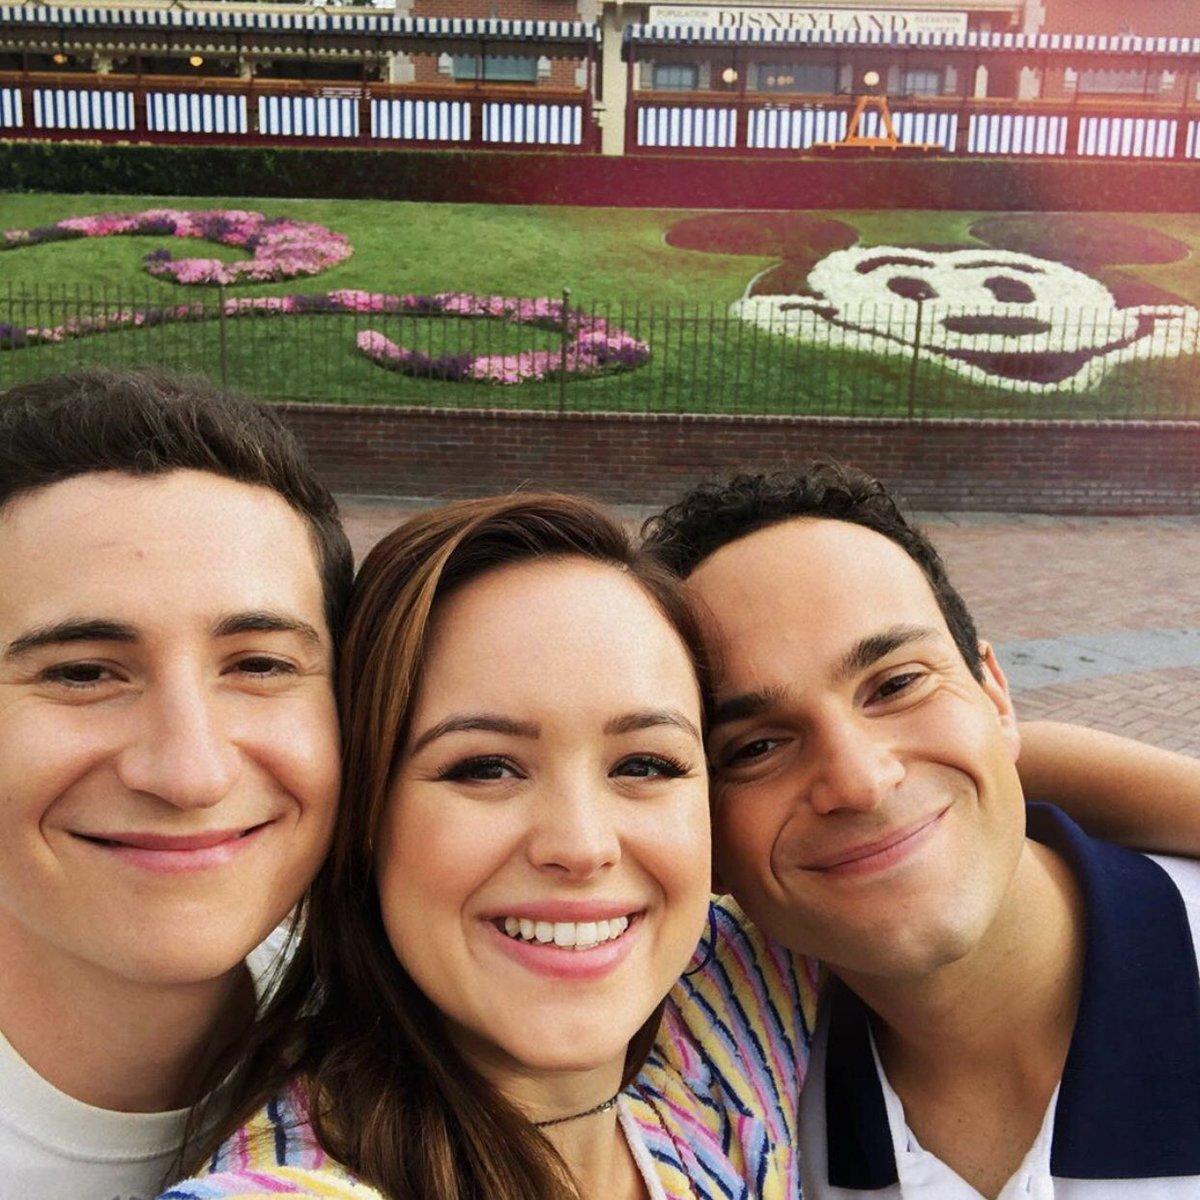 Sam Lerner, Hayley Orrantia, and Troy Gentile | Via ABC